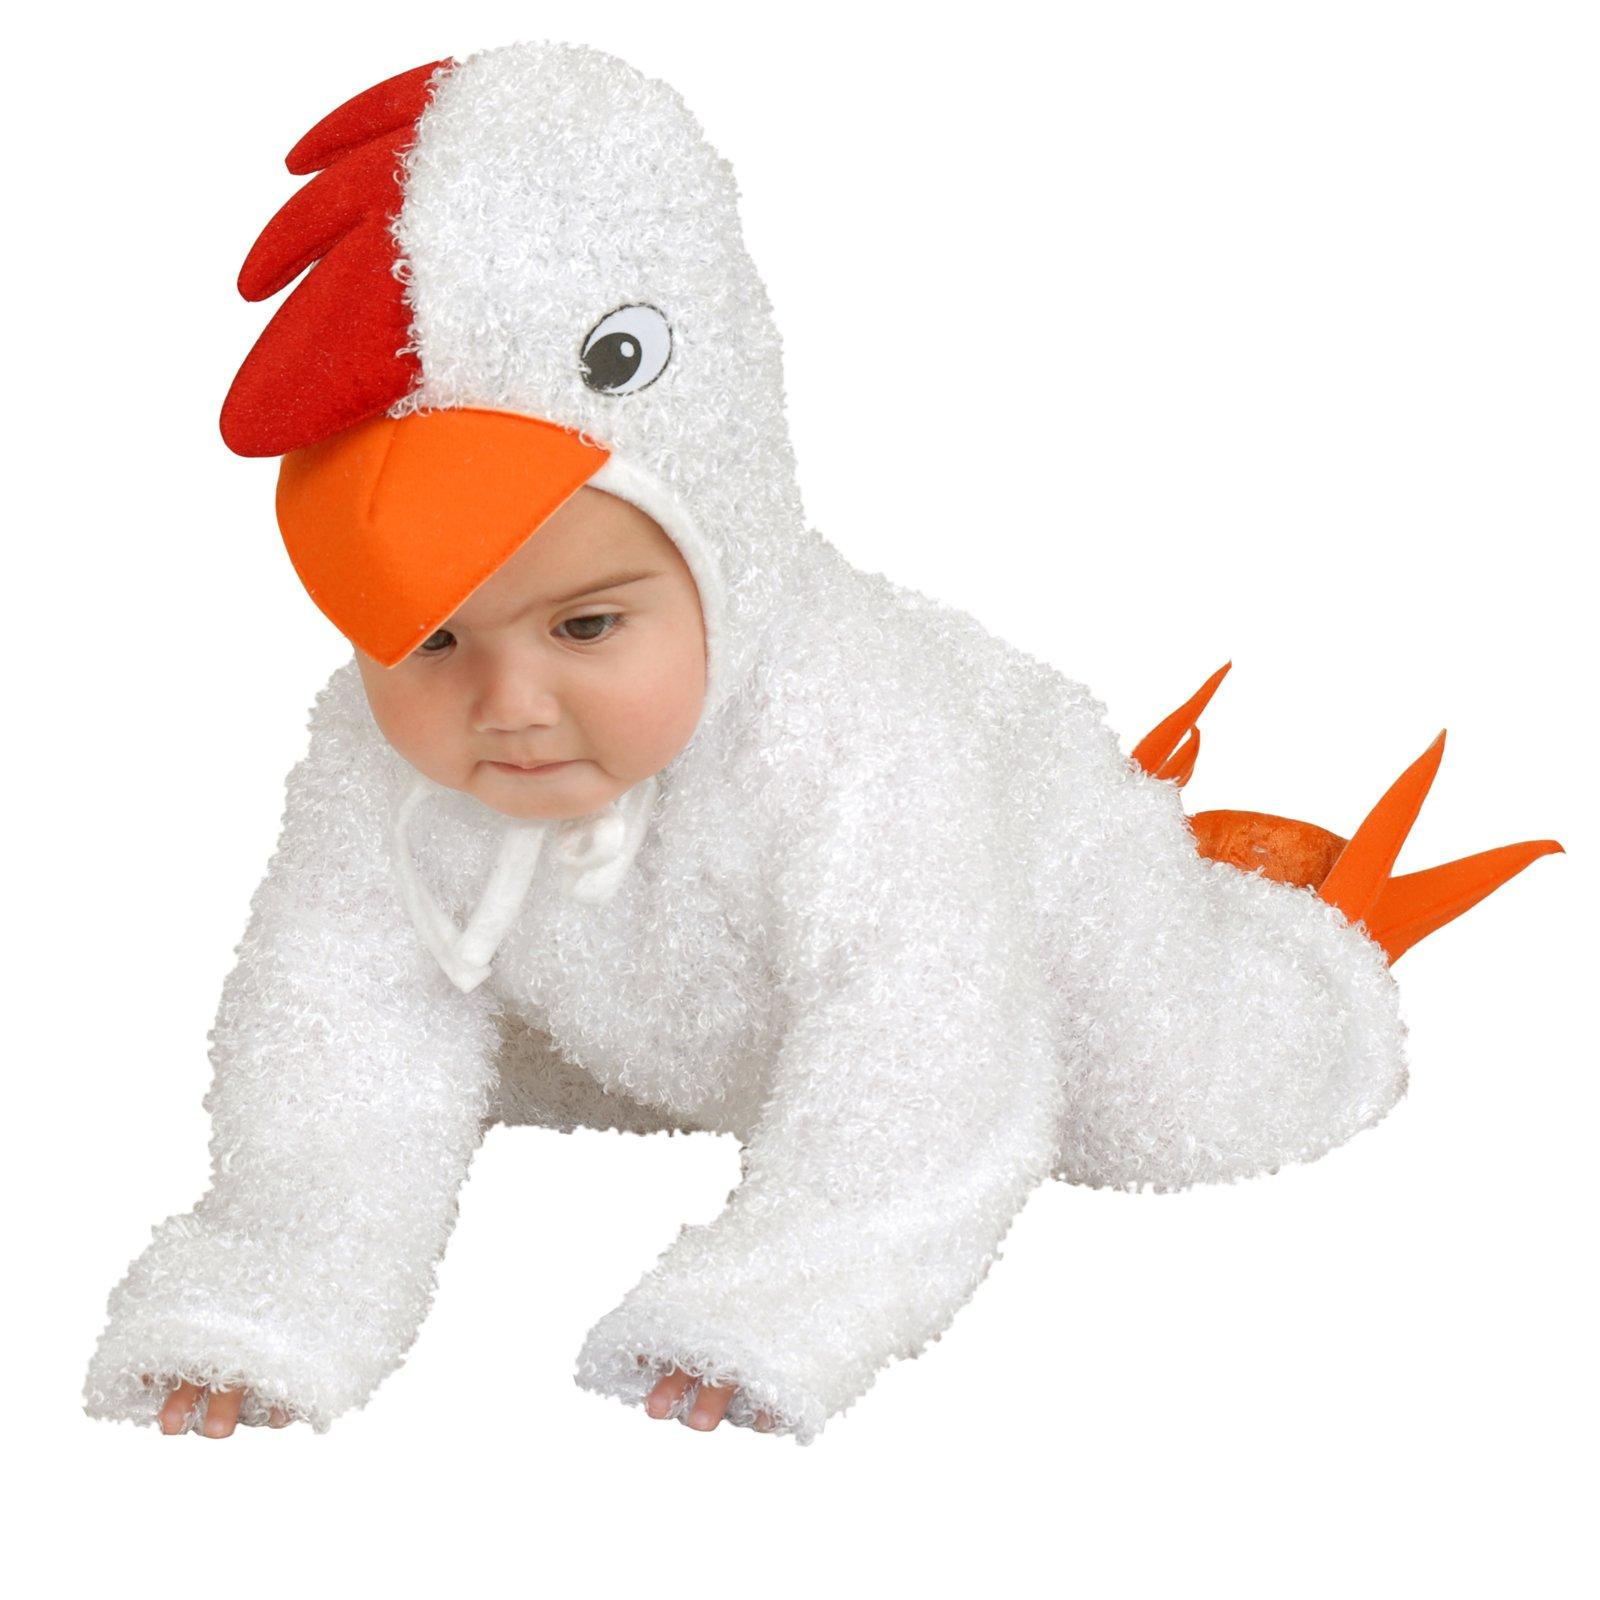 Новогодний костюм малышу своим руками